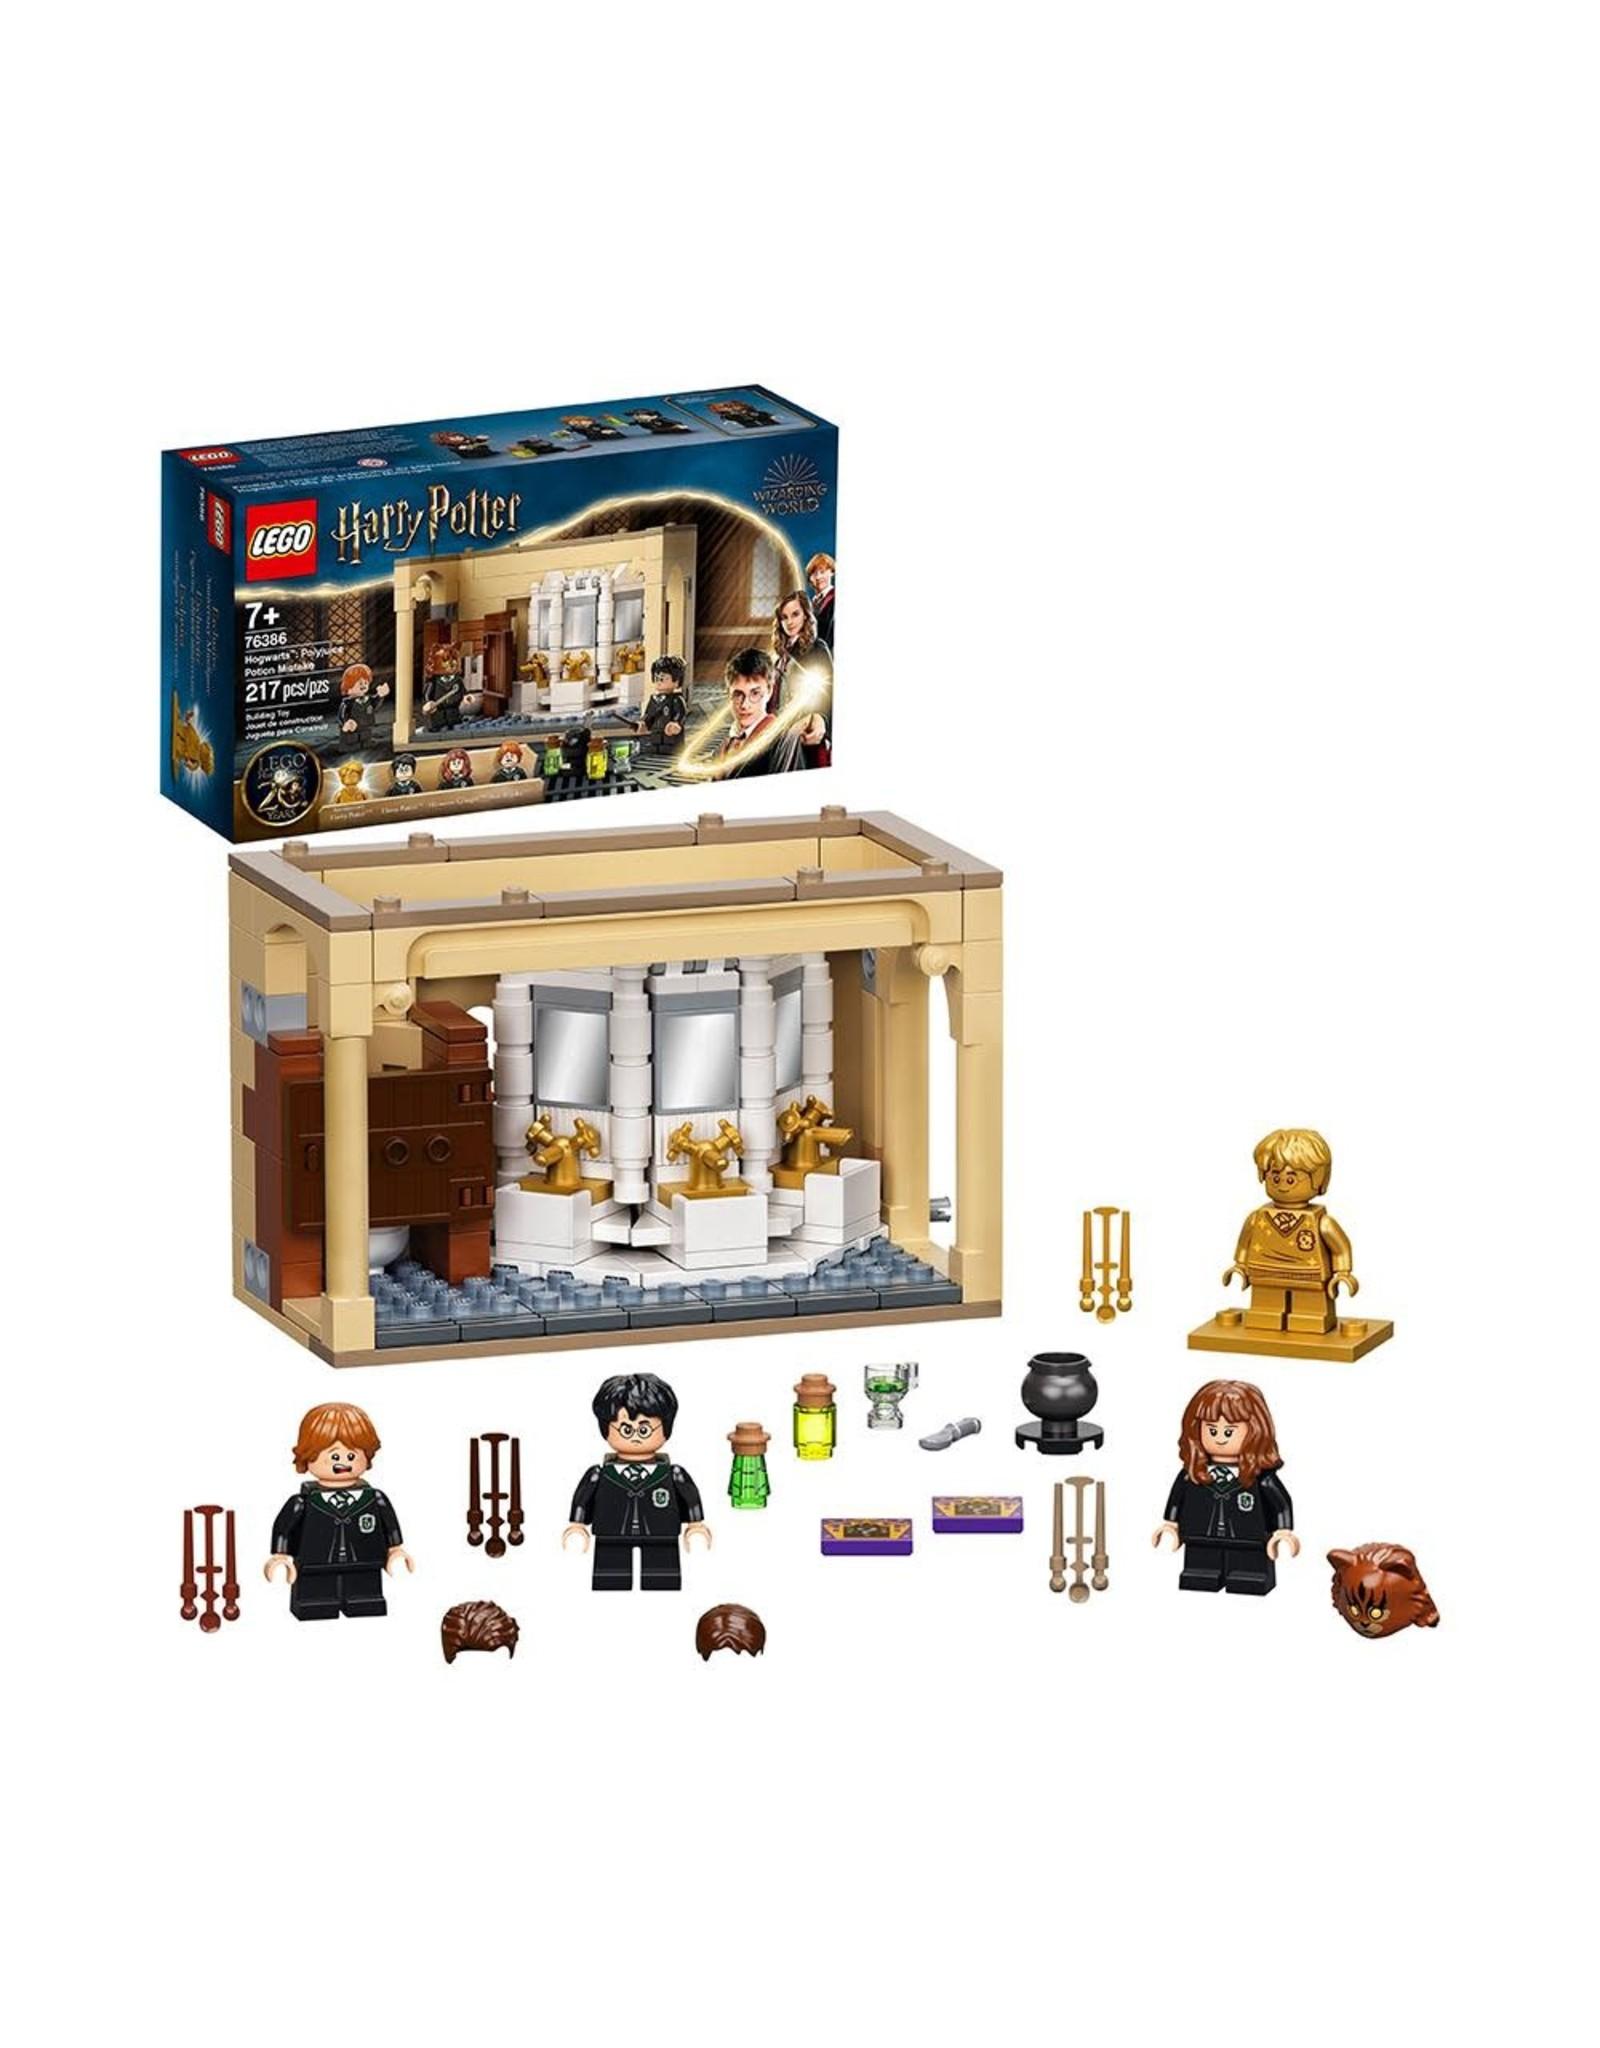 LEGO Harry Potter - 76386 Hogwarts: Polyjuice Potion Mistake